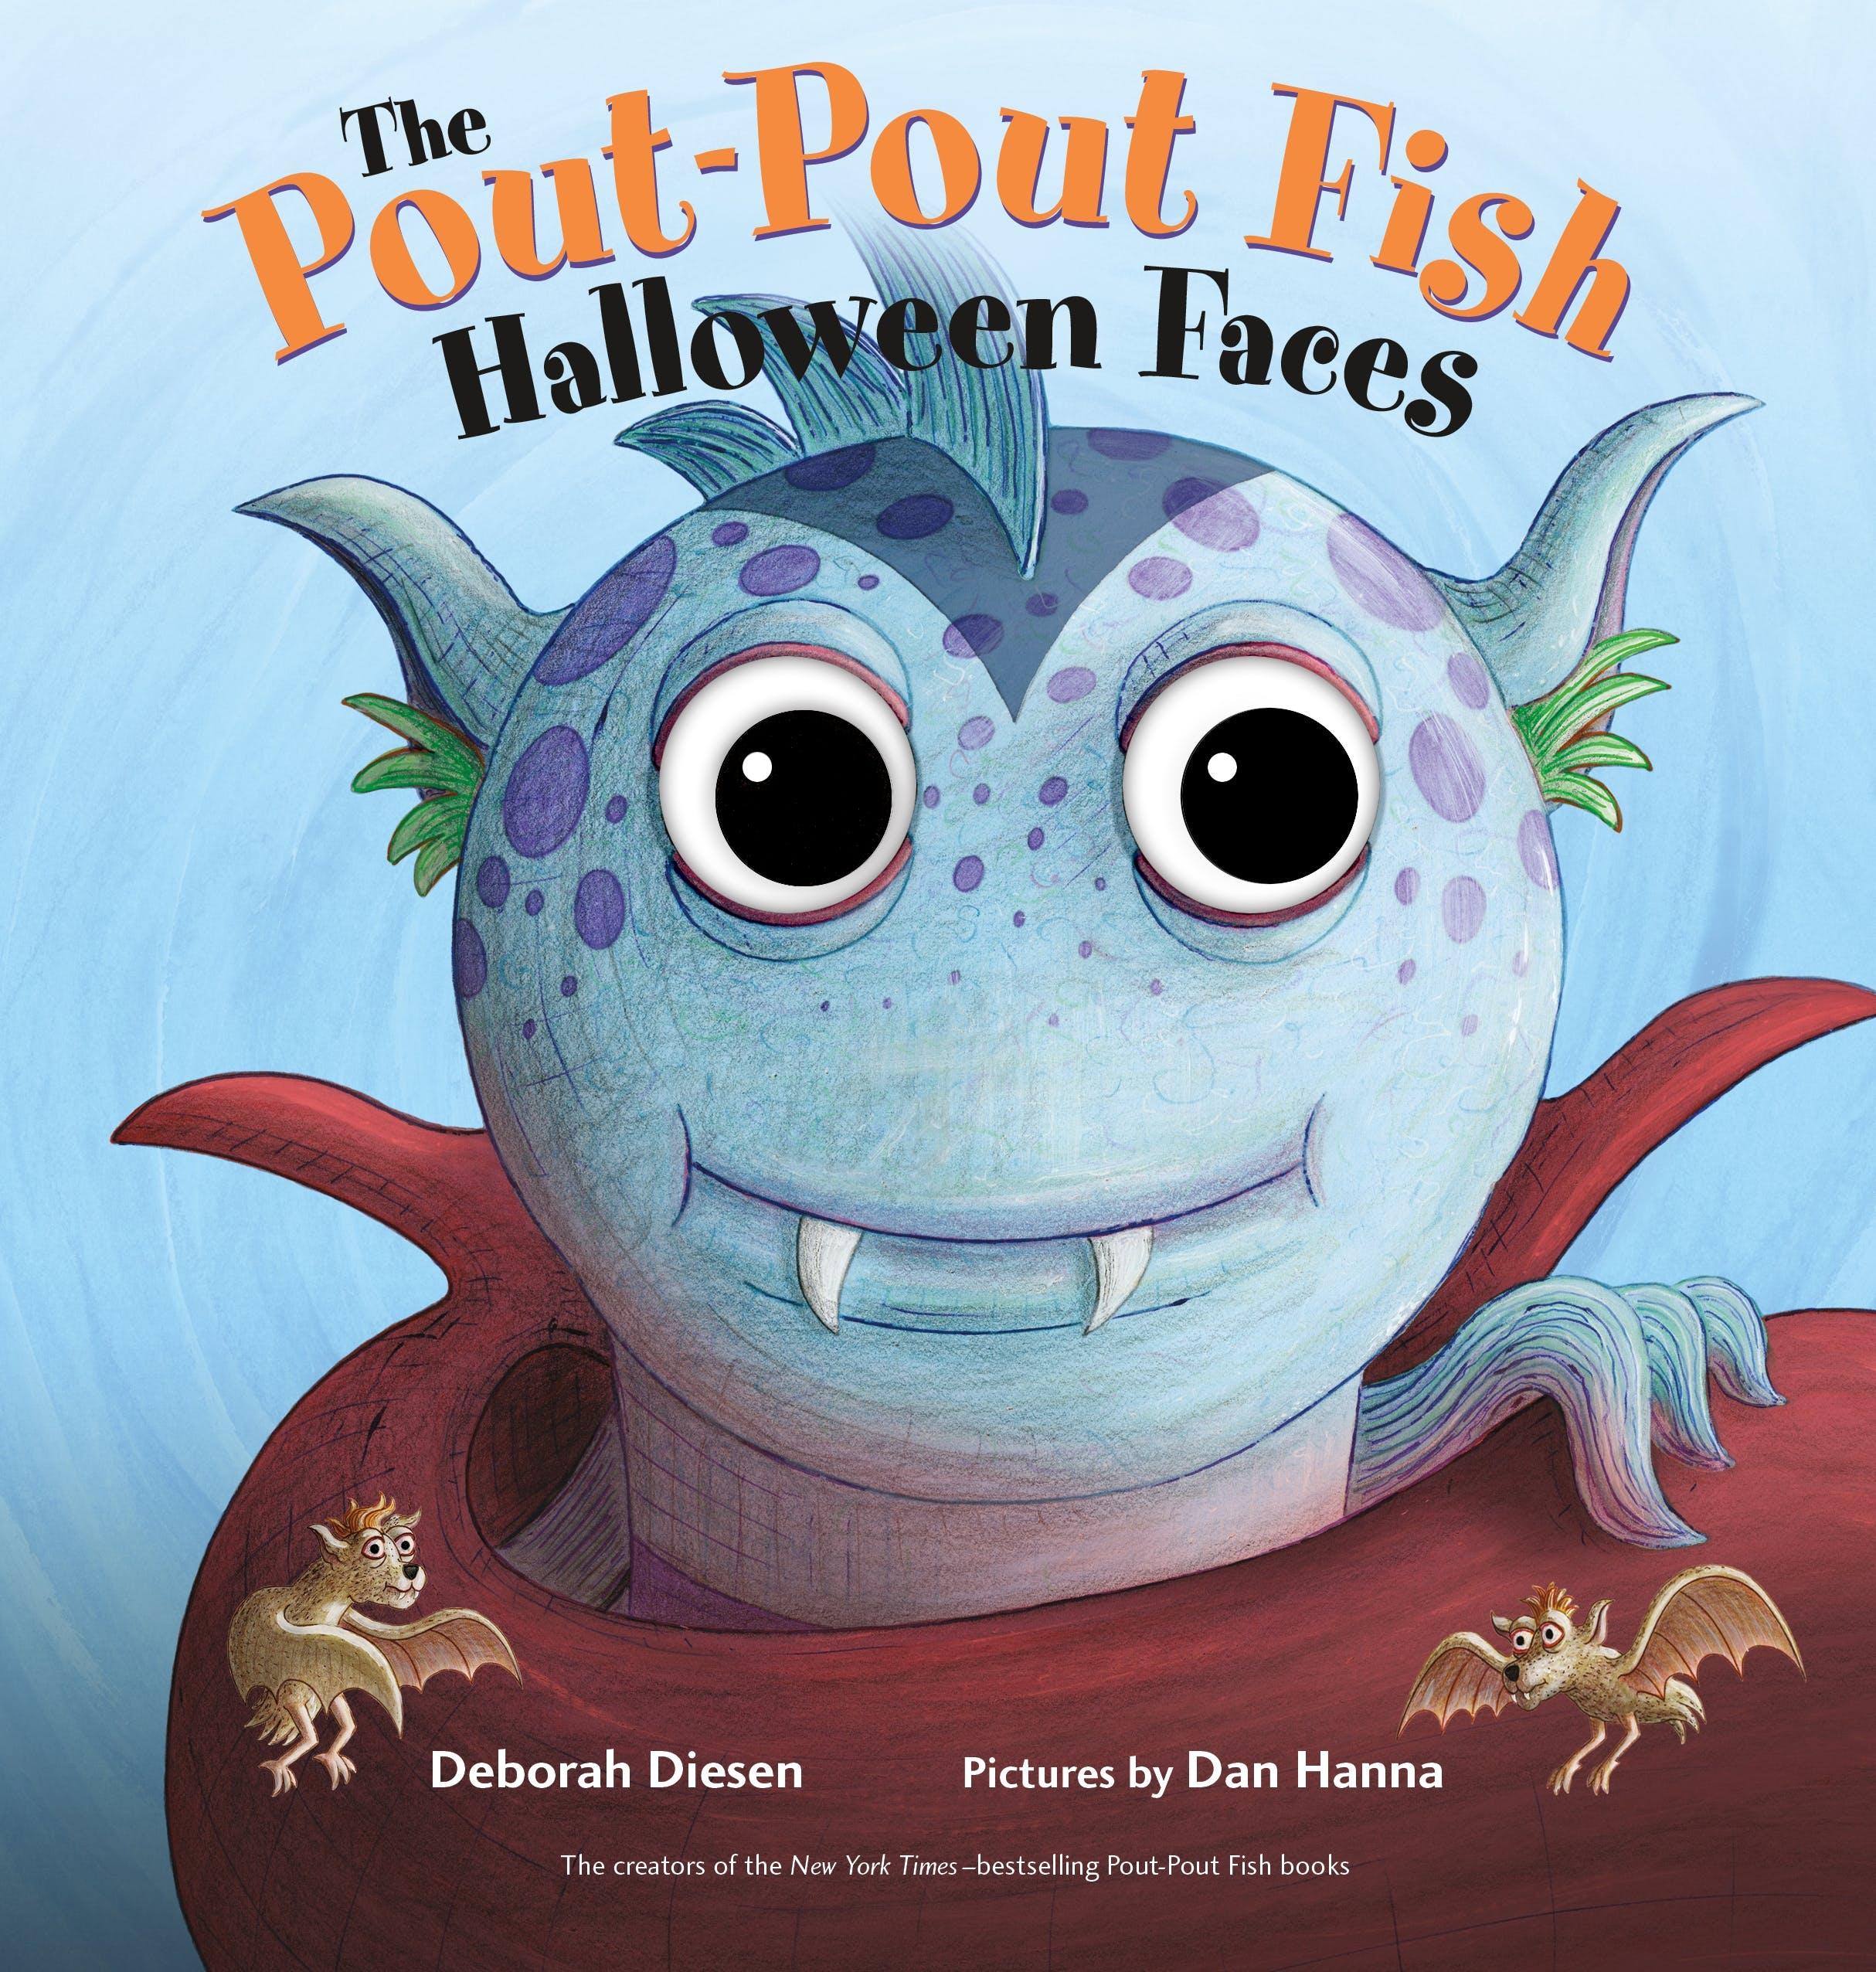 Image of The Pout-Pout Fish Halloween Faces